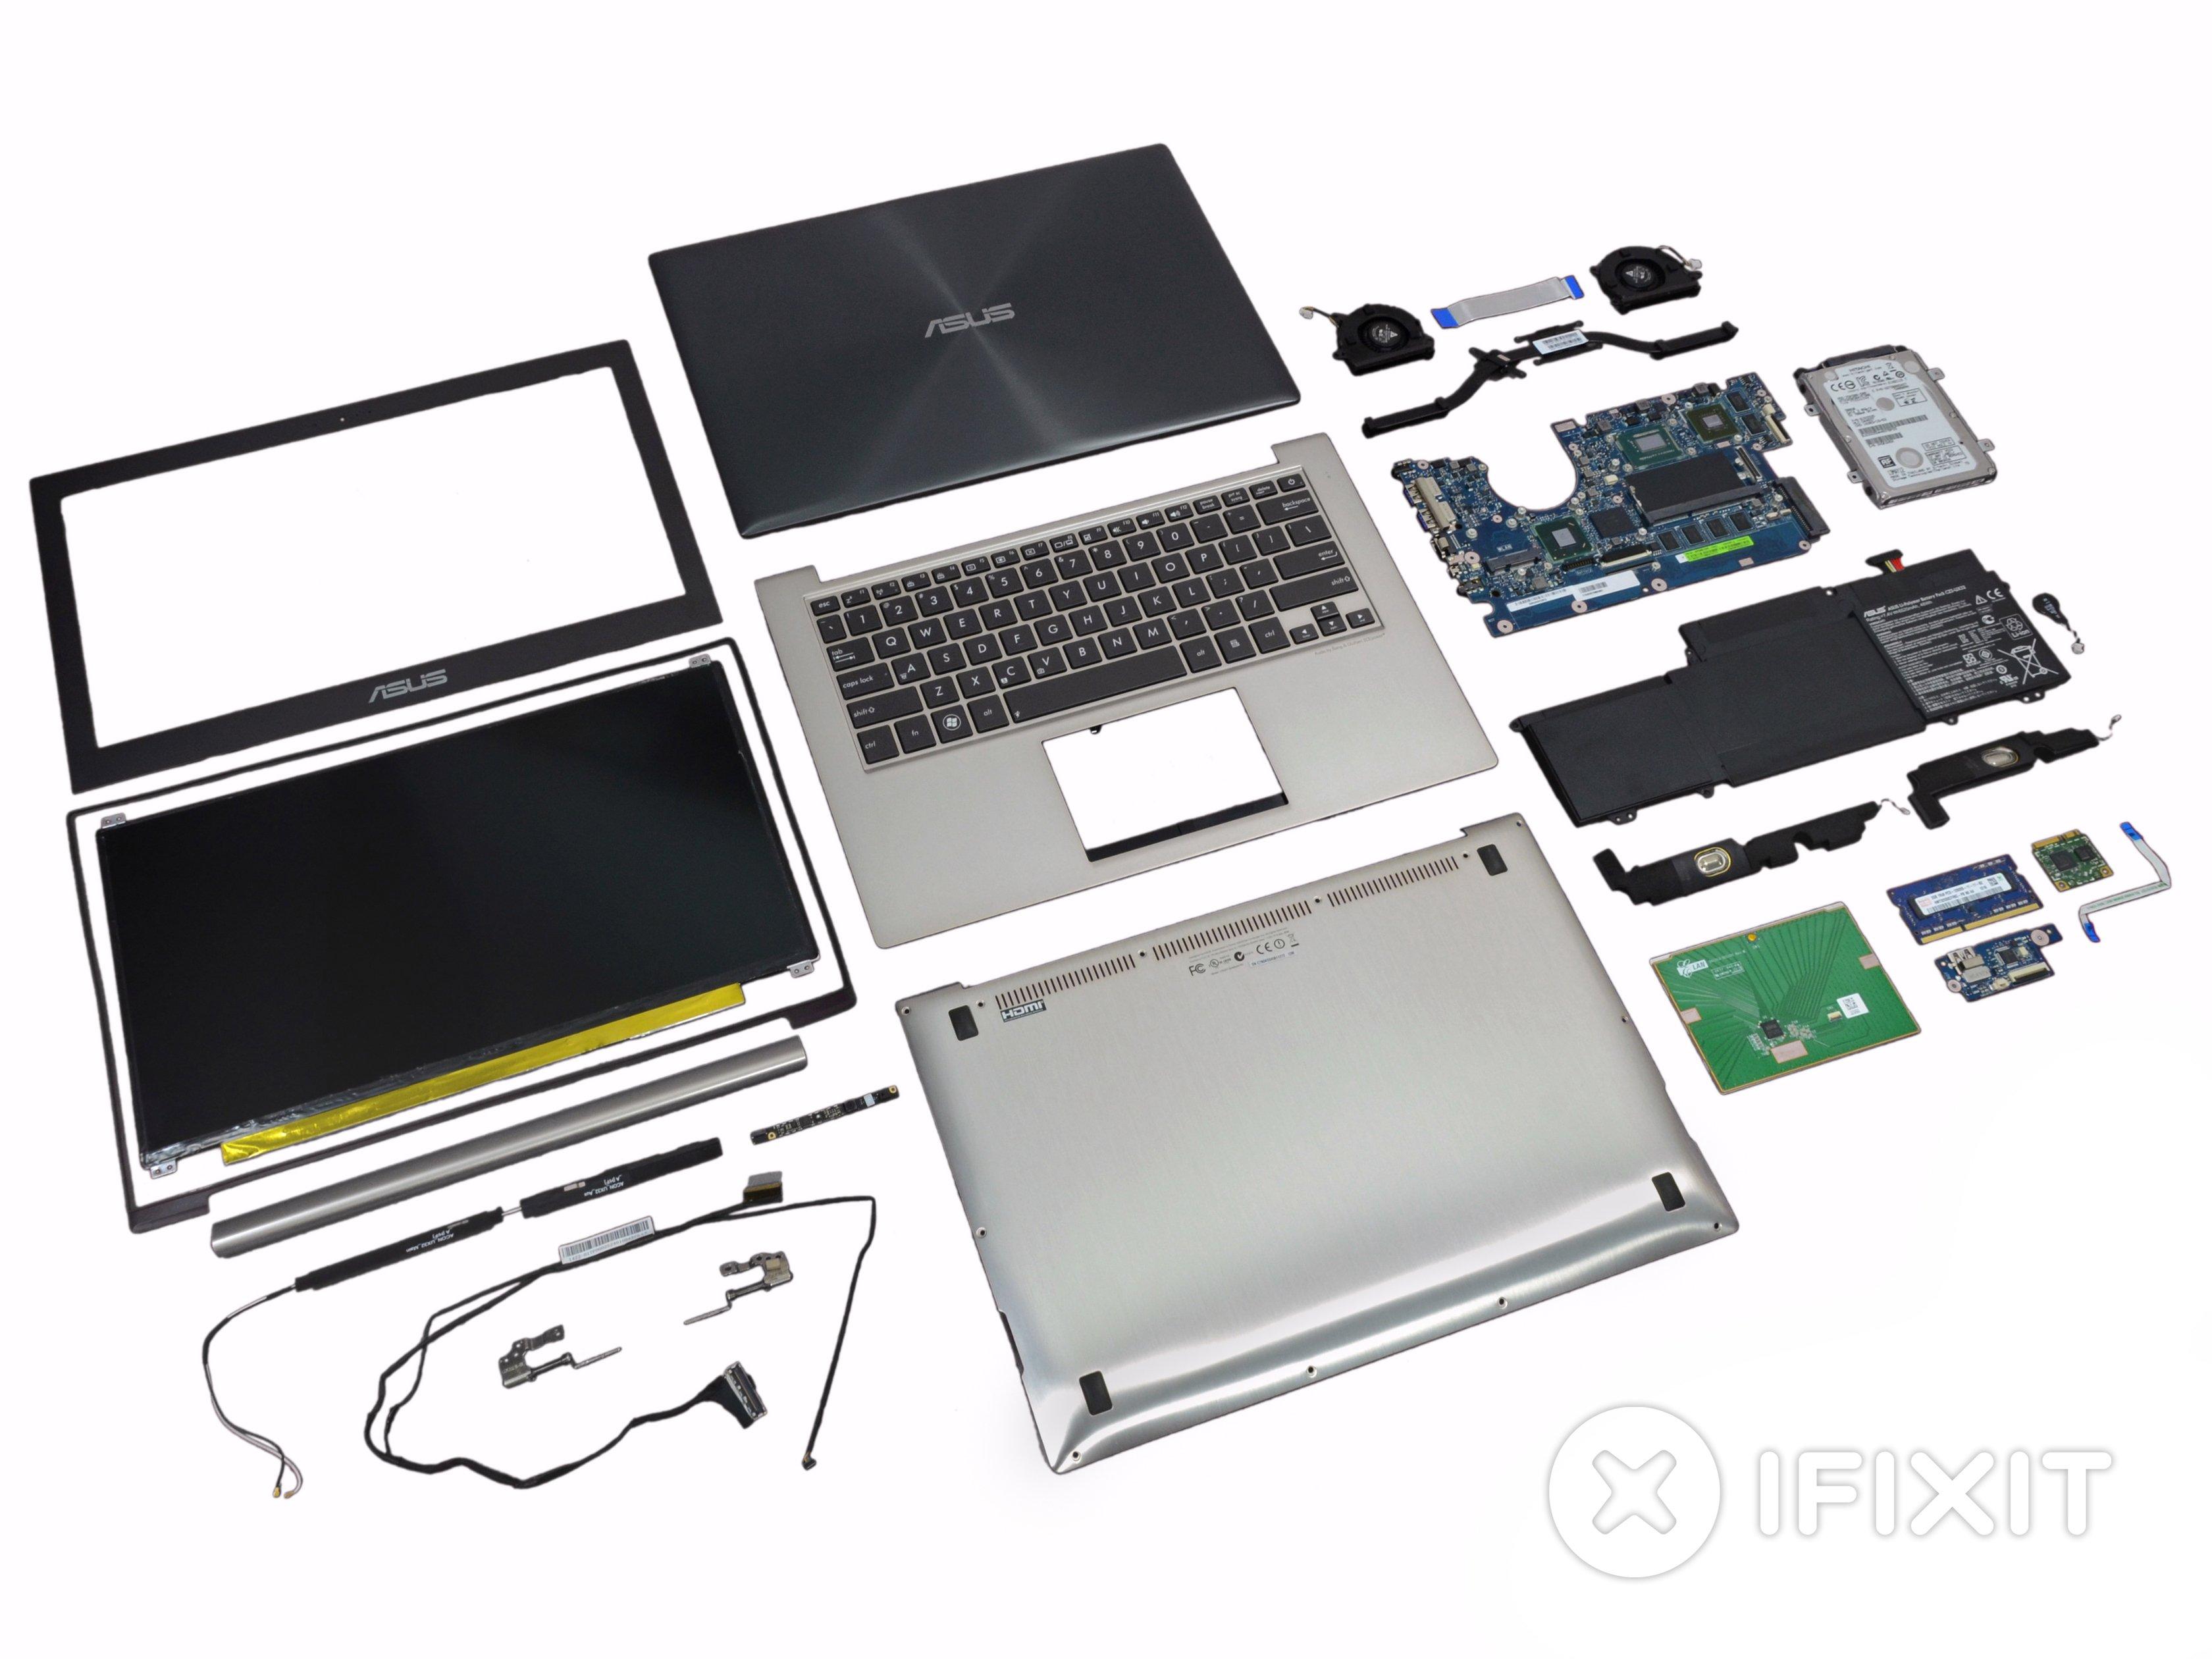 Asus Zenbook UX32VD Teardown - iFixit